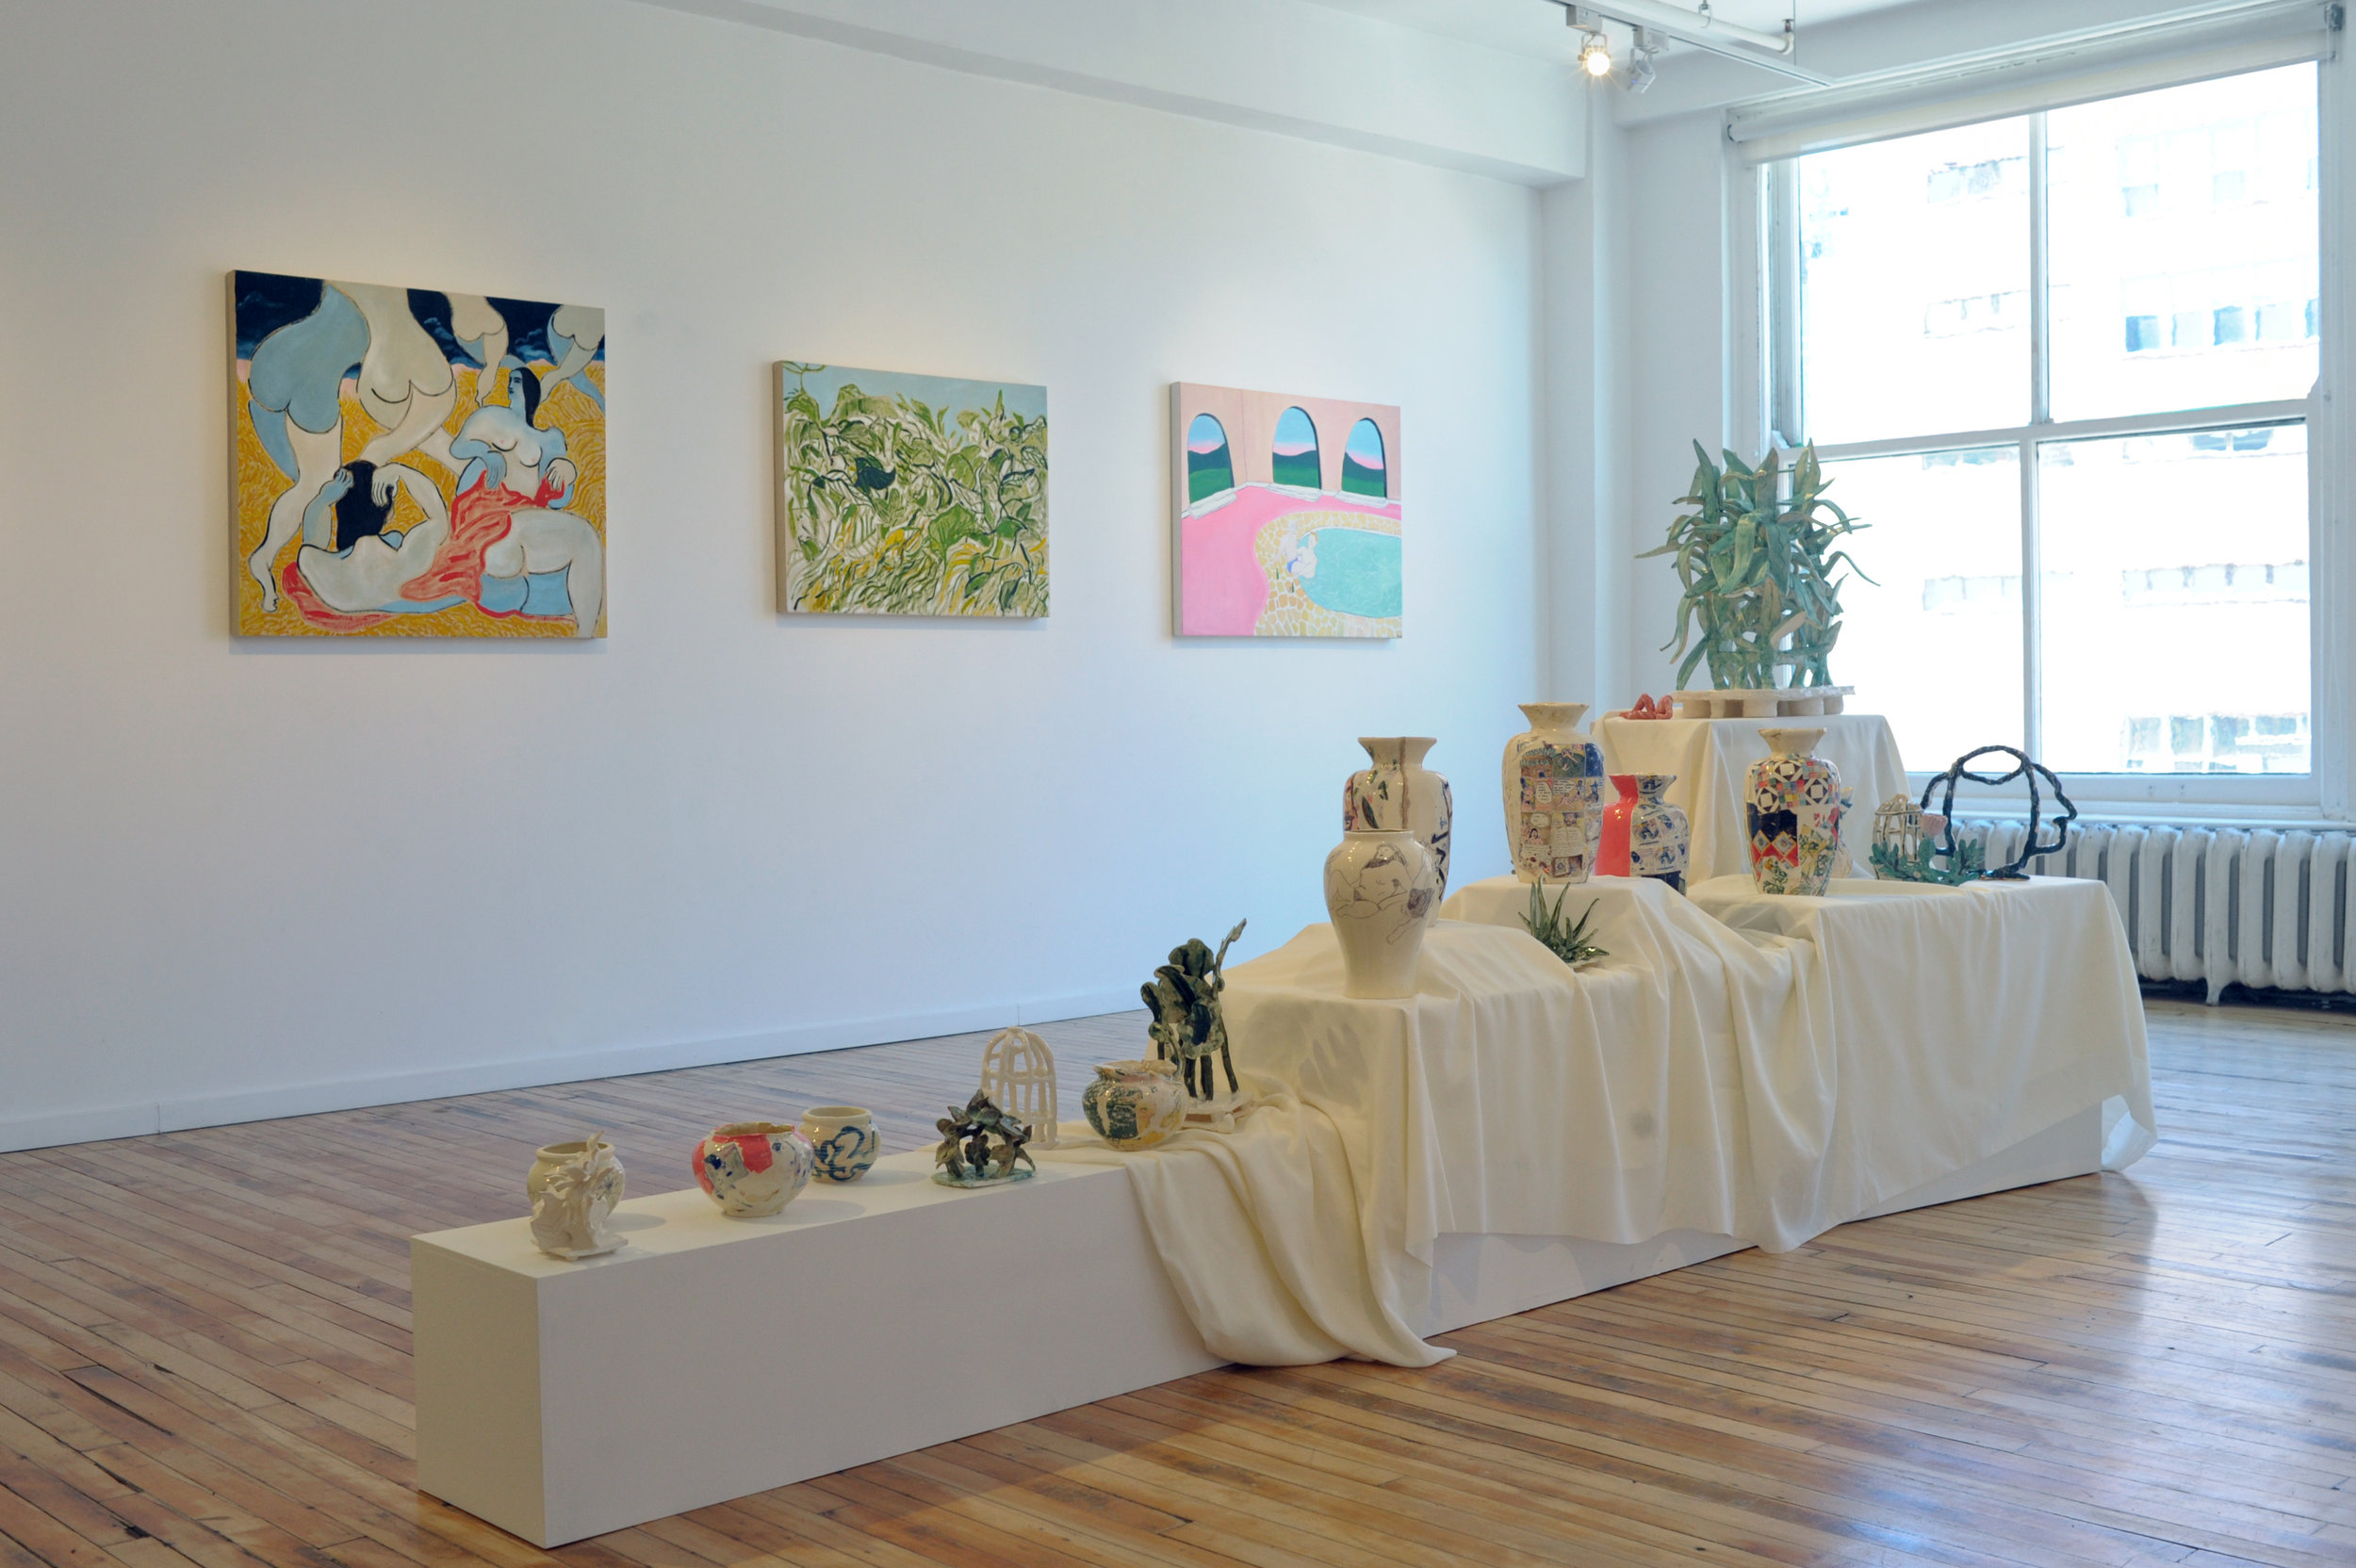 WestWall_Ceramics + Paintings_by all .JPG